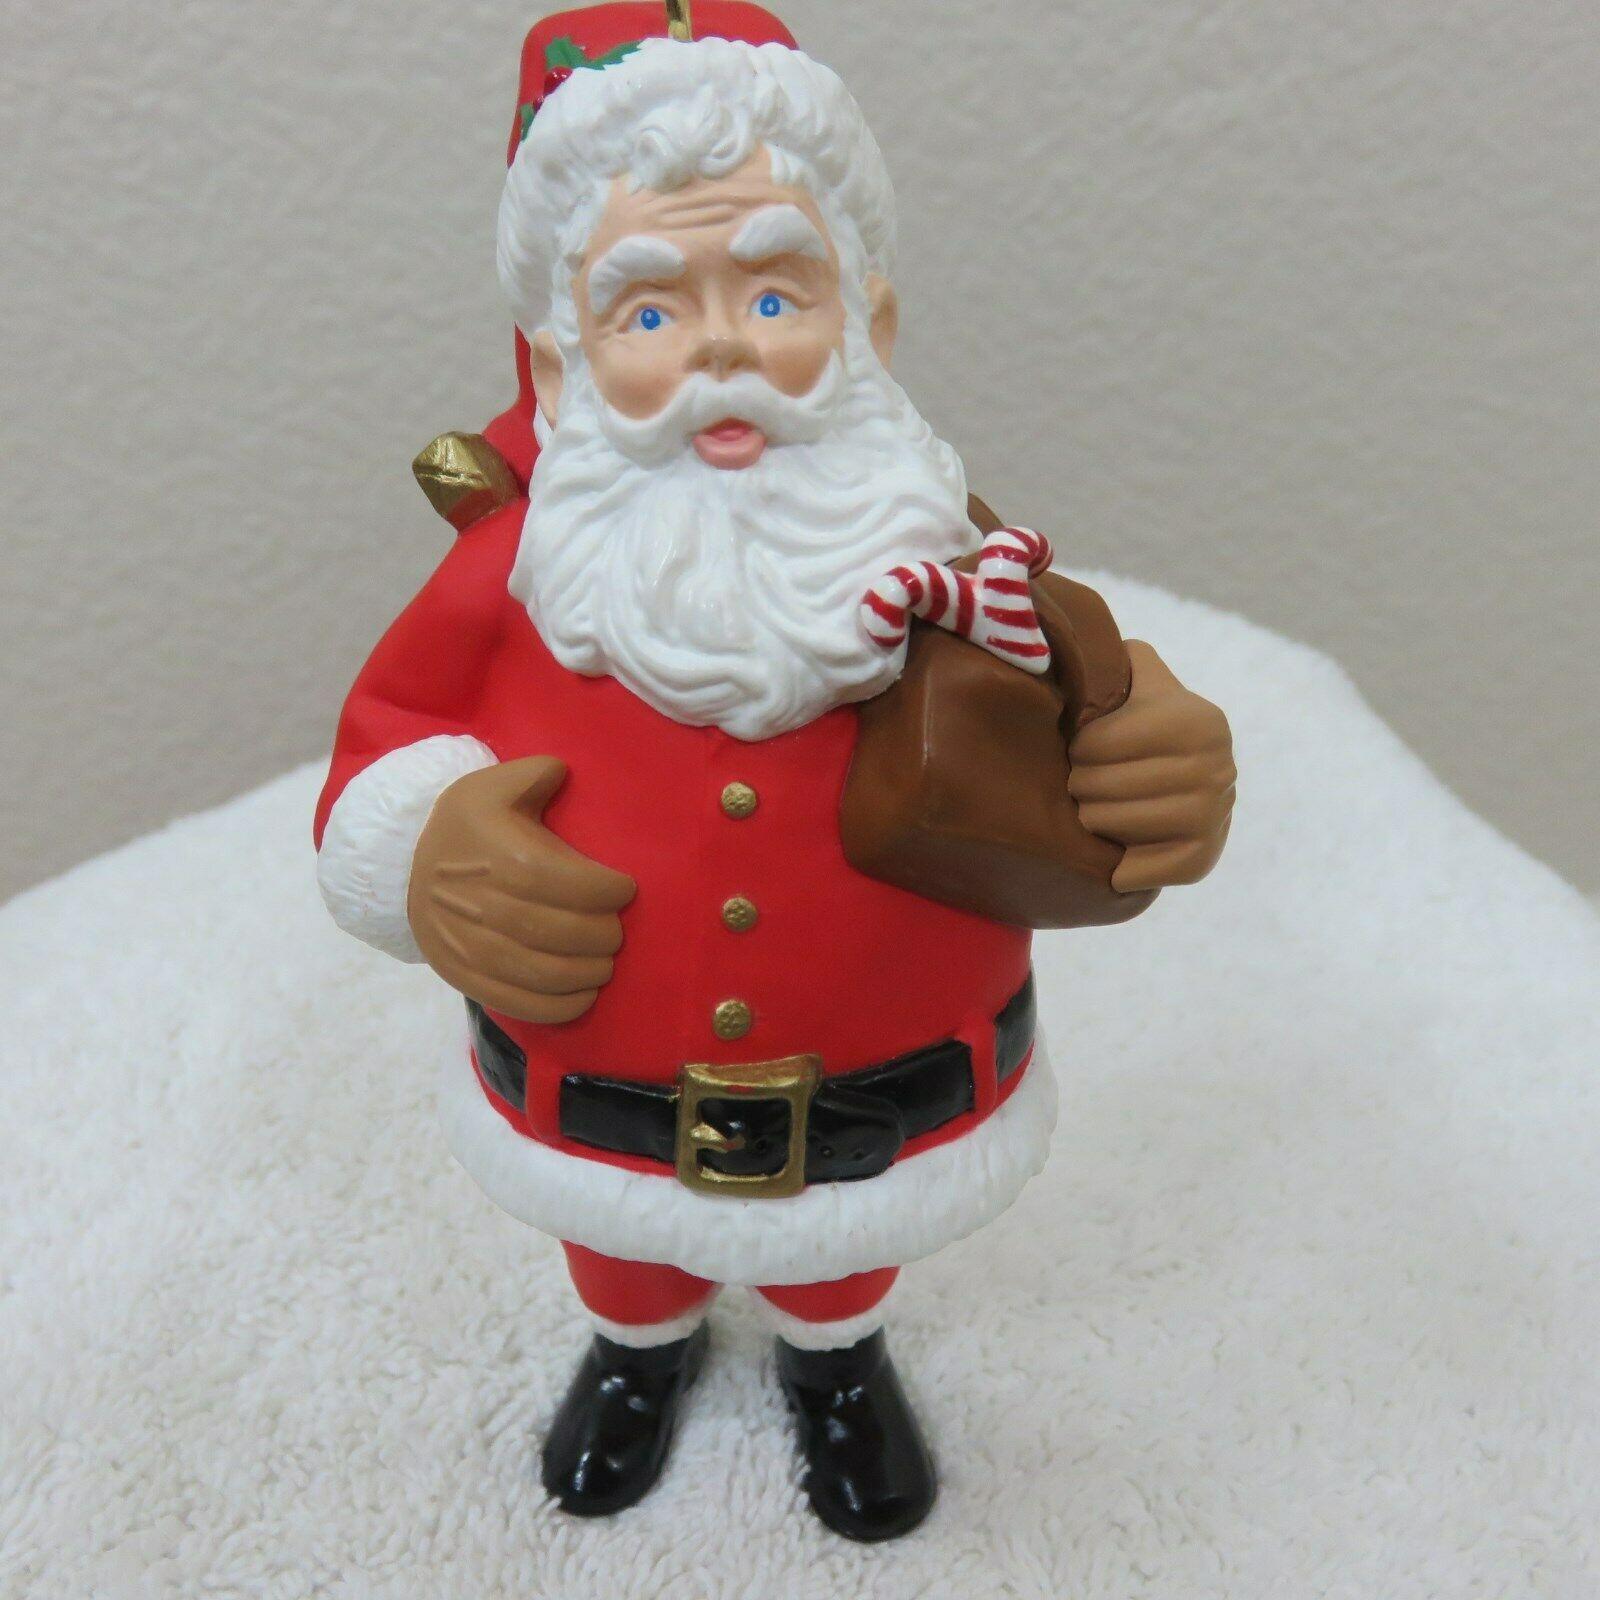 Vintage 1996 Hallmark Keepsake Ornament Santa in Original Box image 10